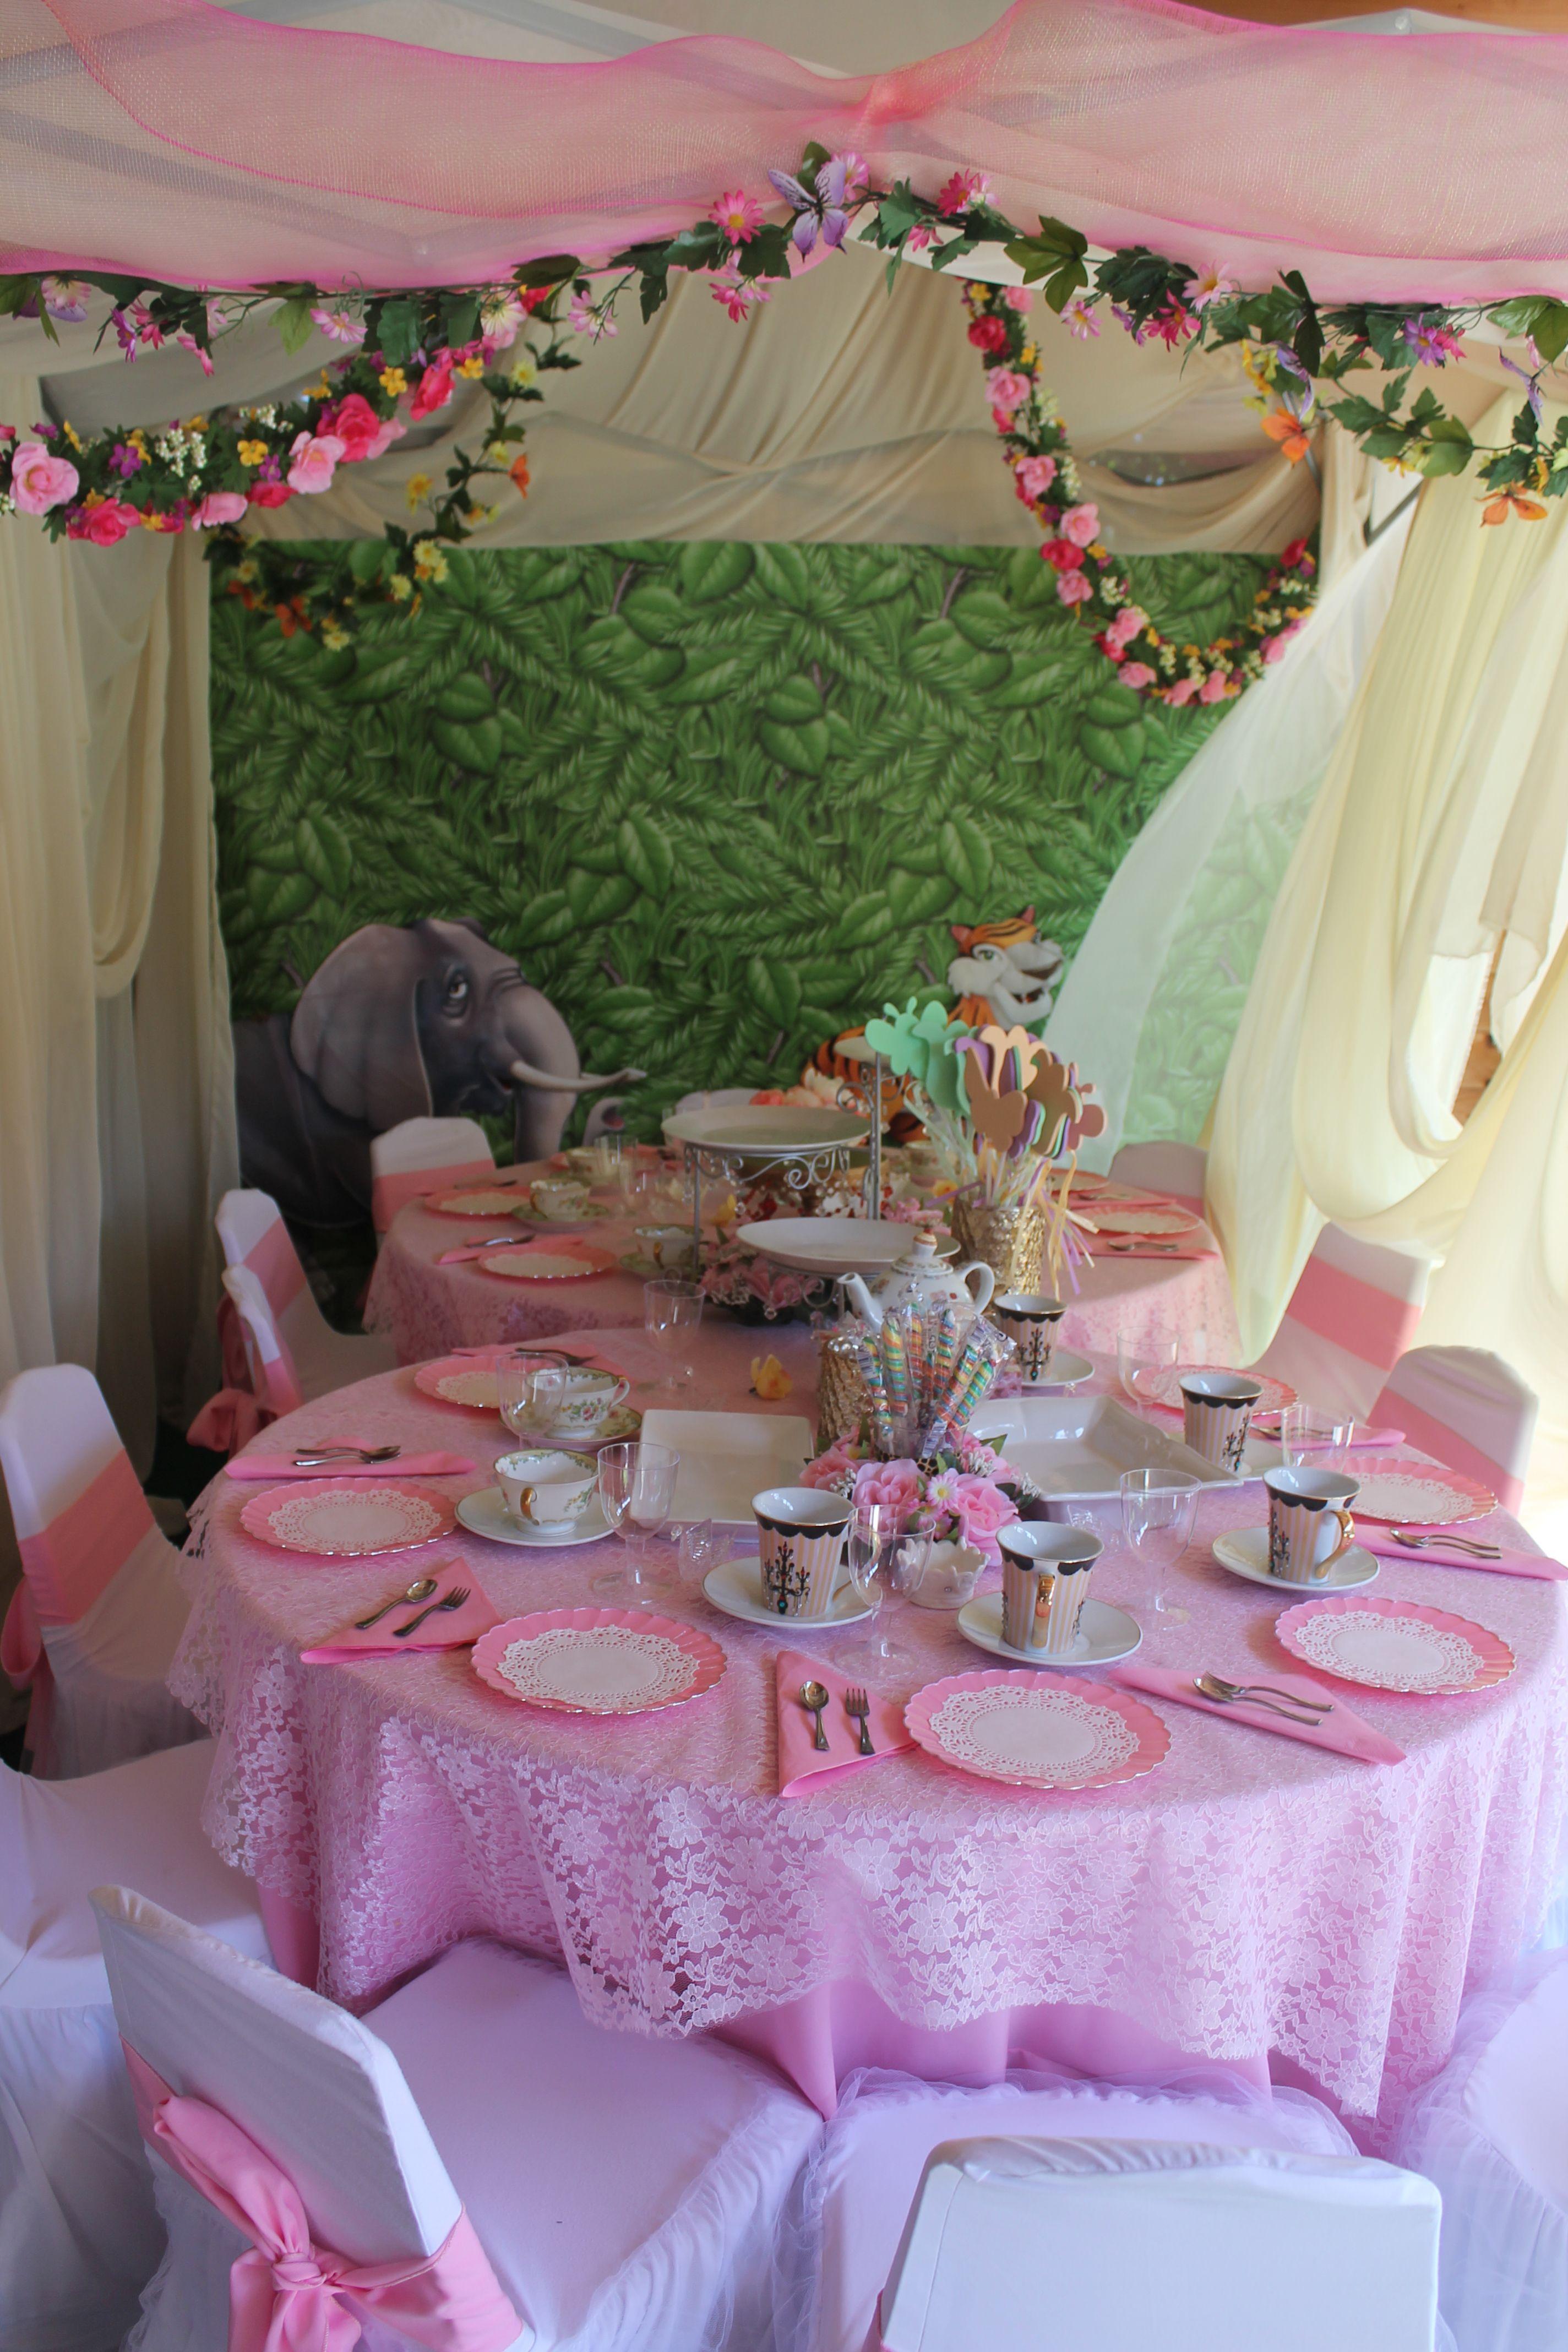 Kids tea party table - Princes tea birthday party princess tea party ideas princess tea party centerpieces princess